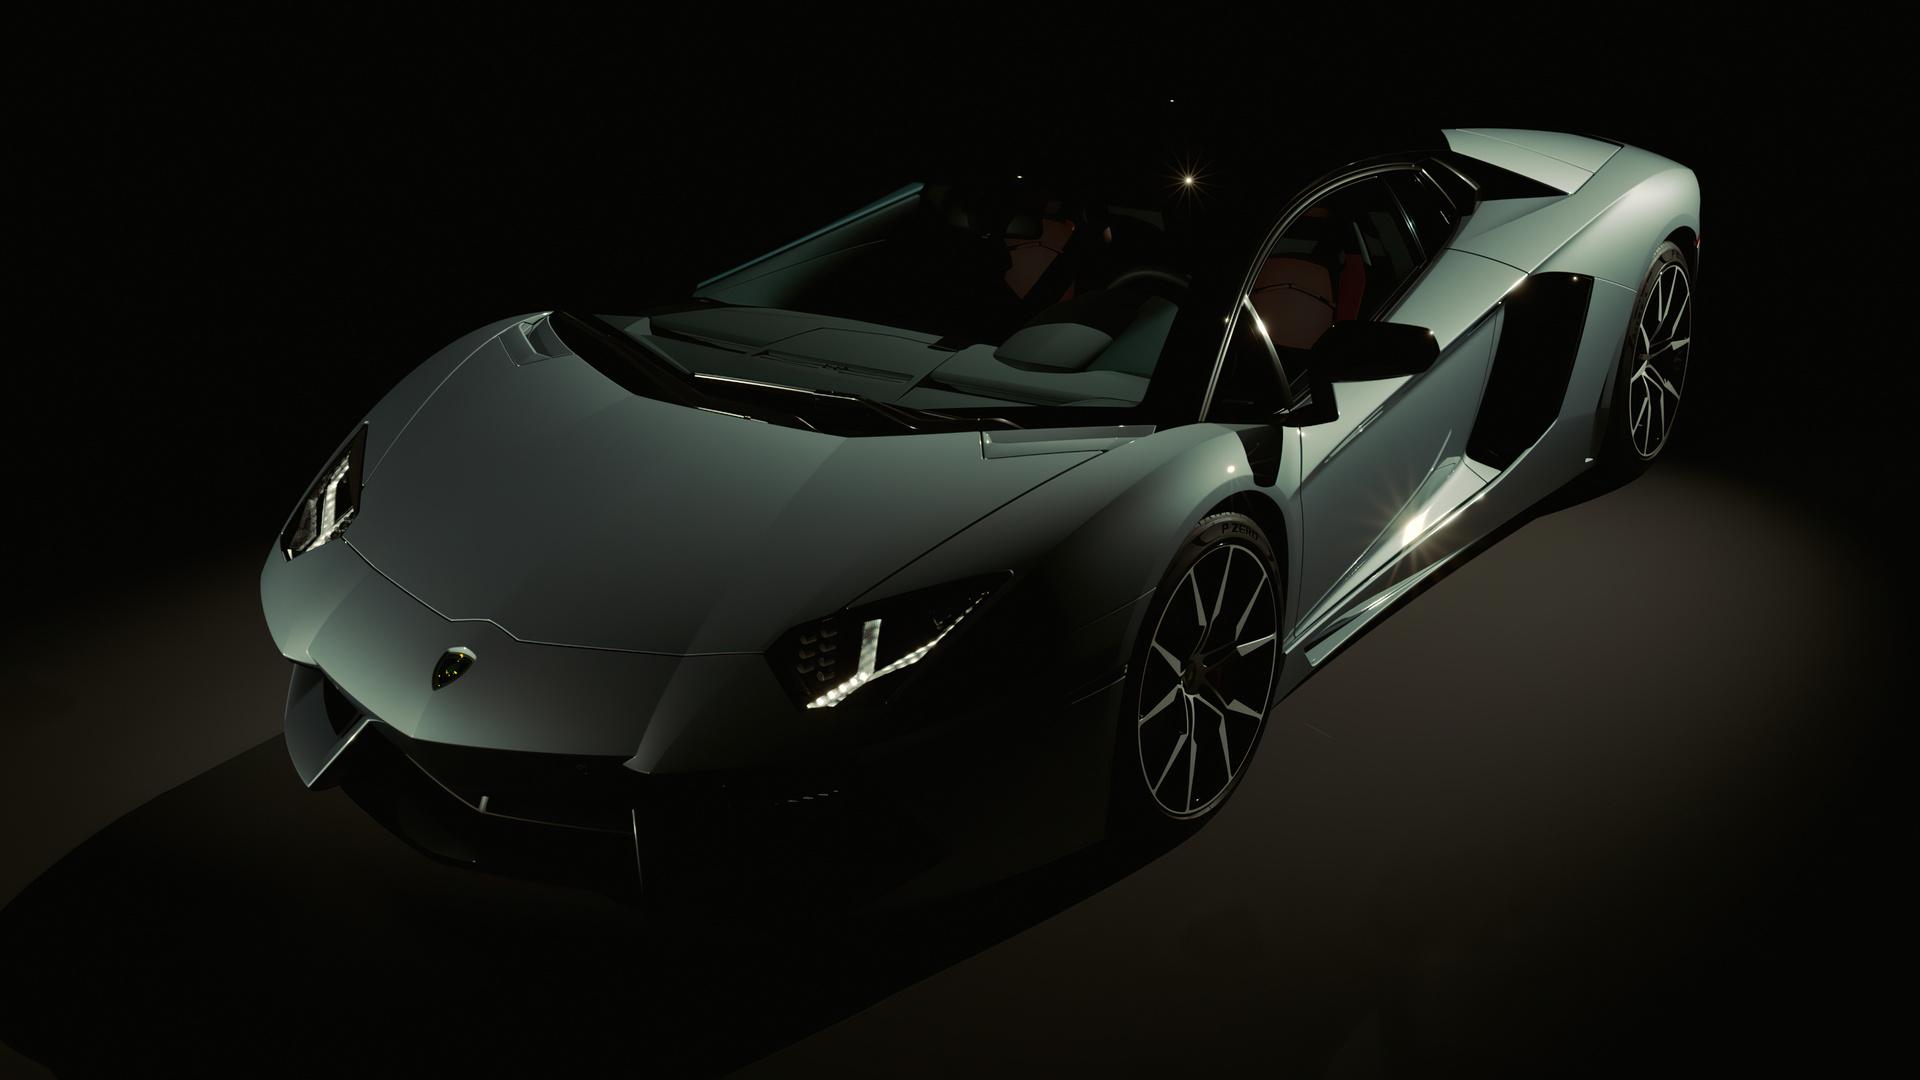 lamborghini, aventador, авто,суперкар,серый,тёмный фон